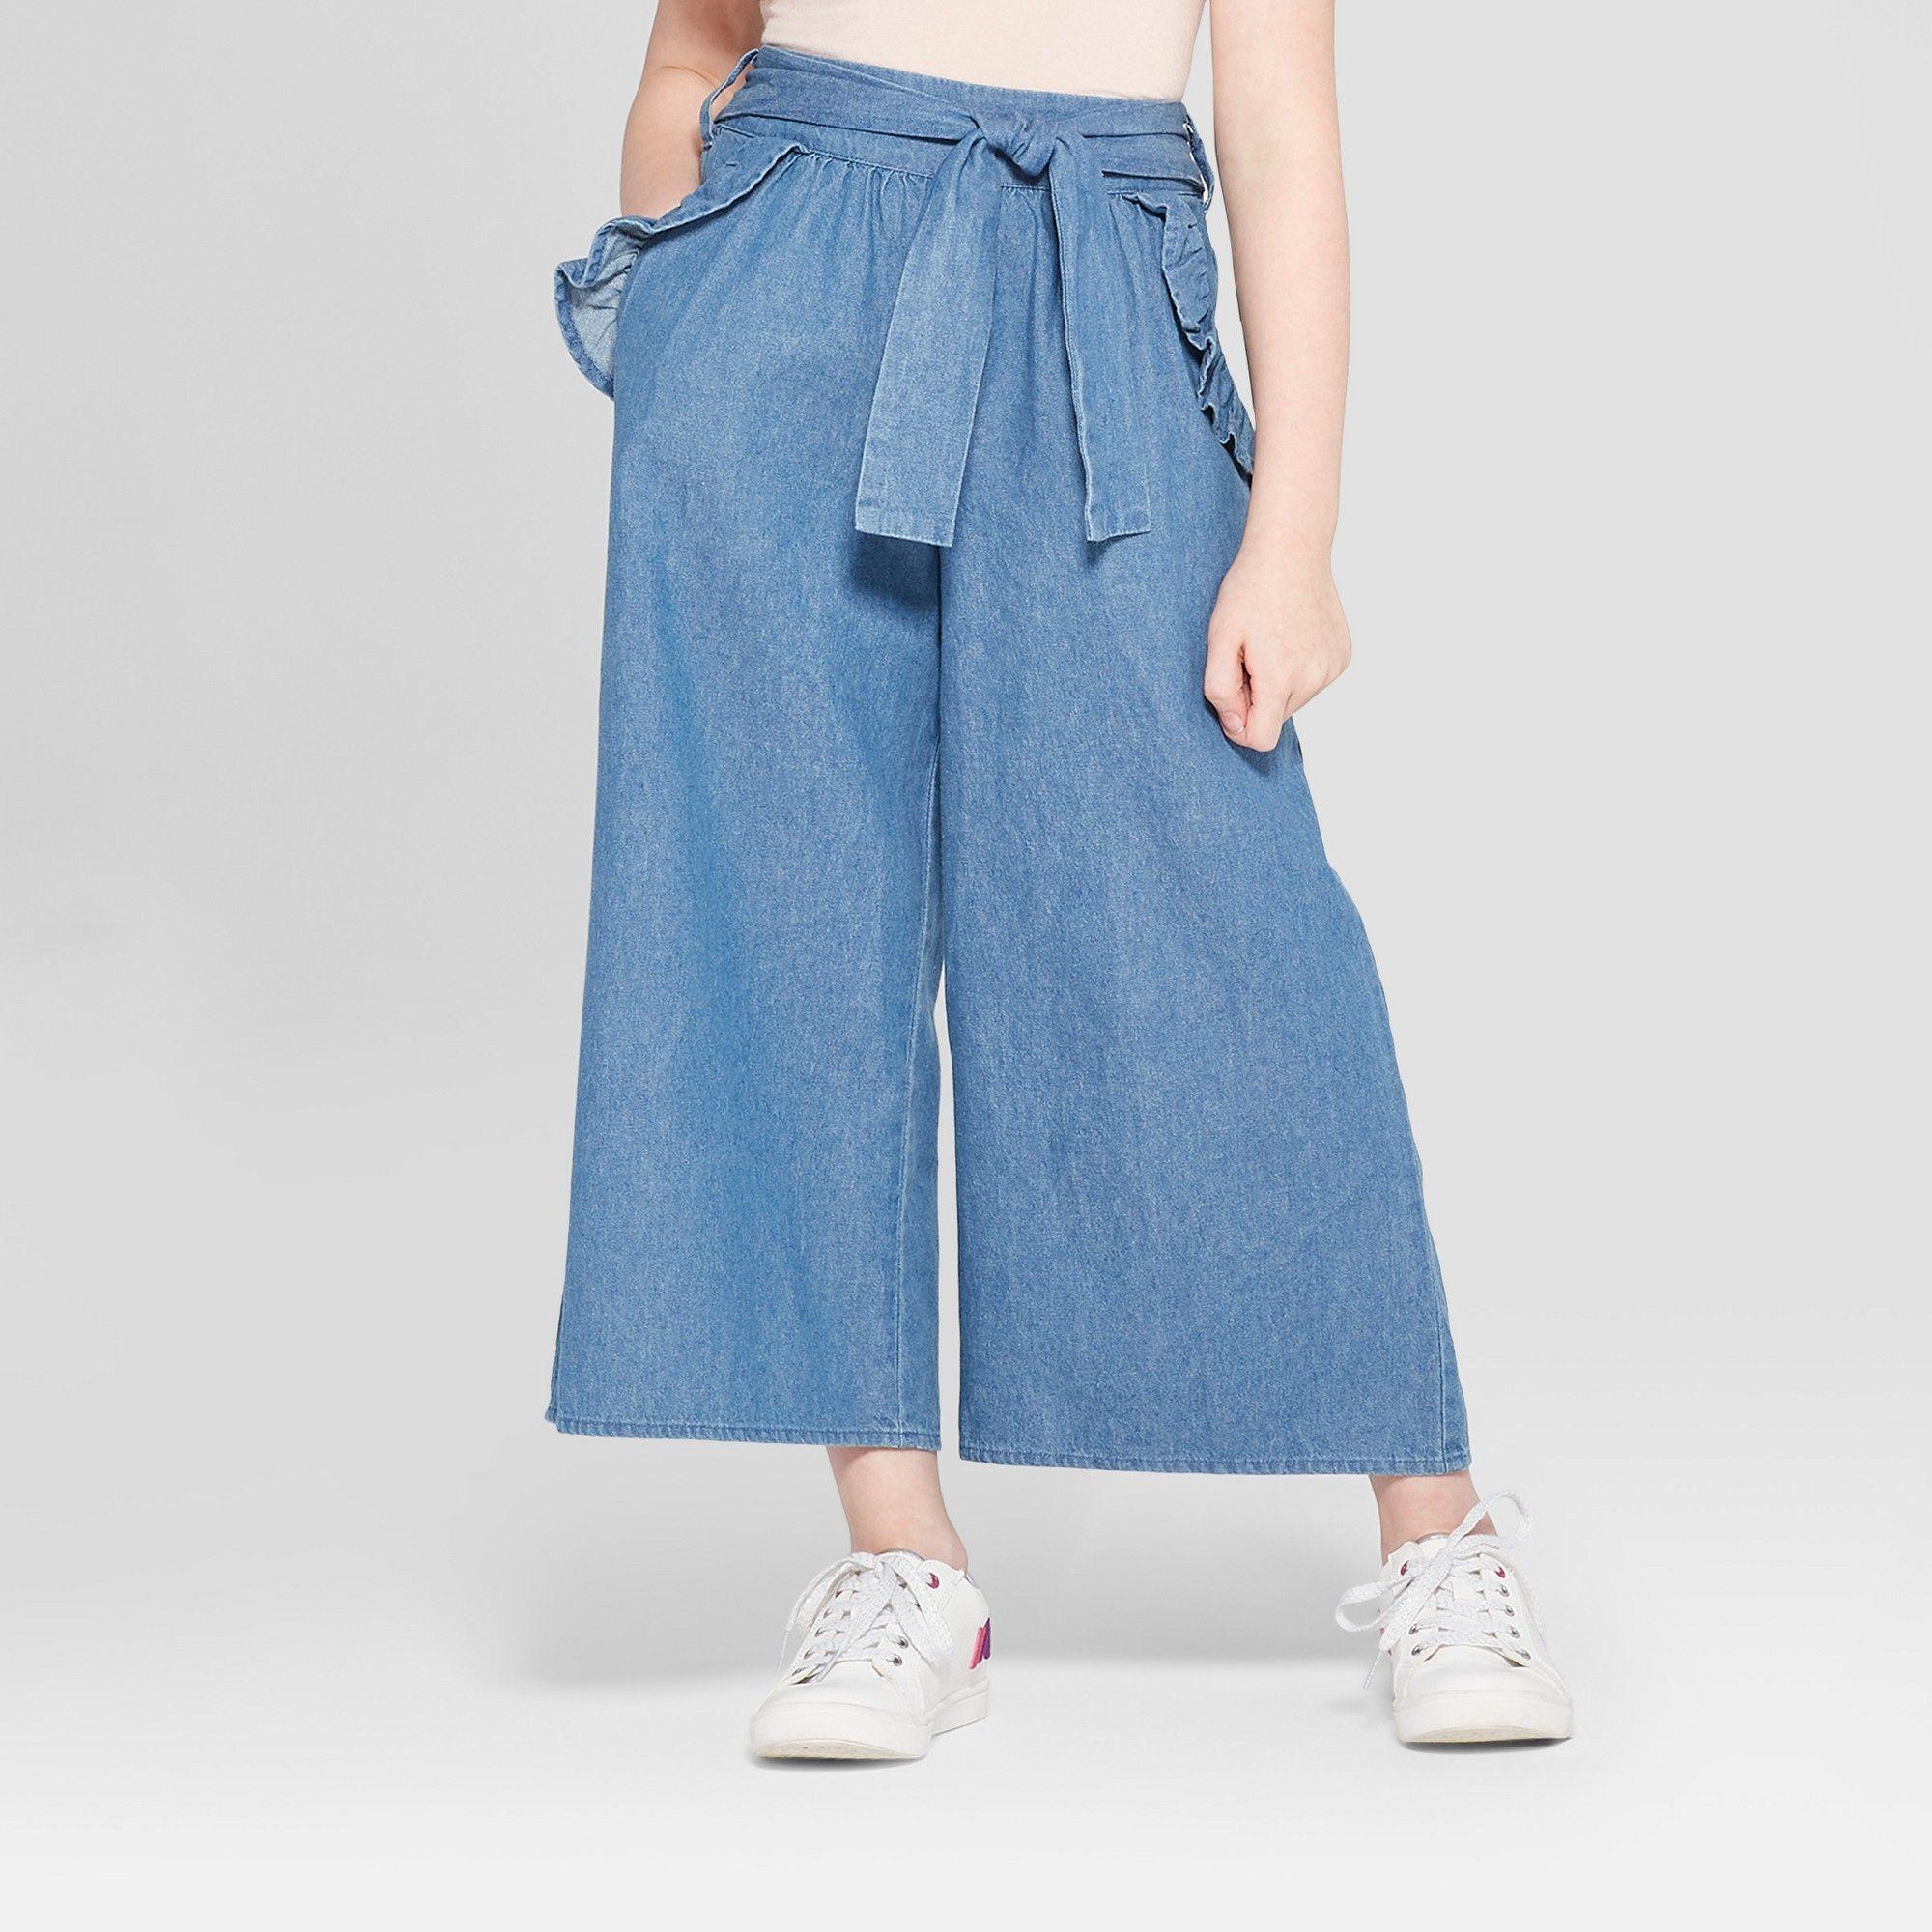 6ae1fb38c1 Girls' Front Tie Paperbag Waist Pants - art class Denim XS, Blue ...